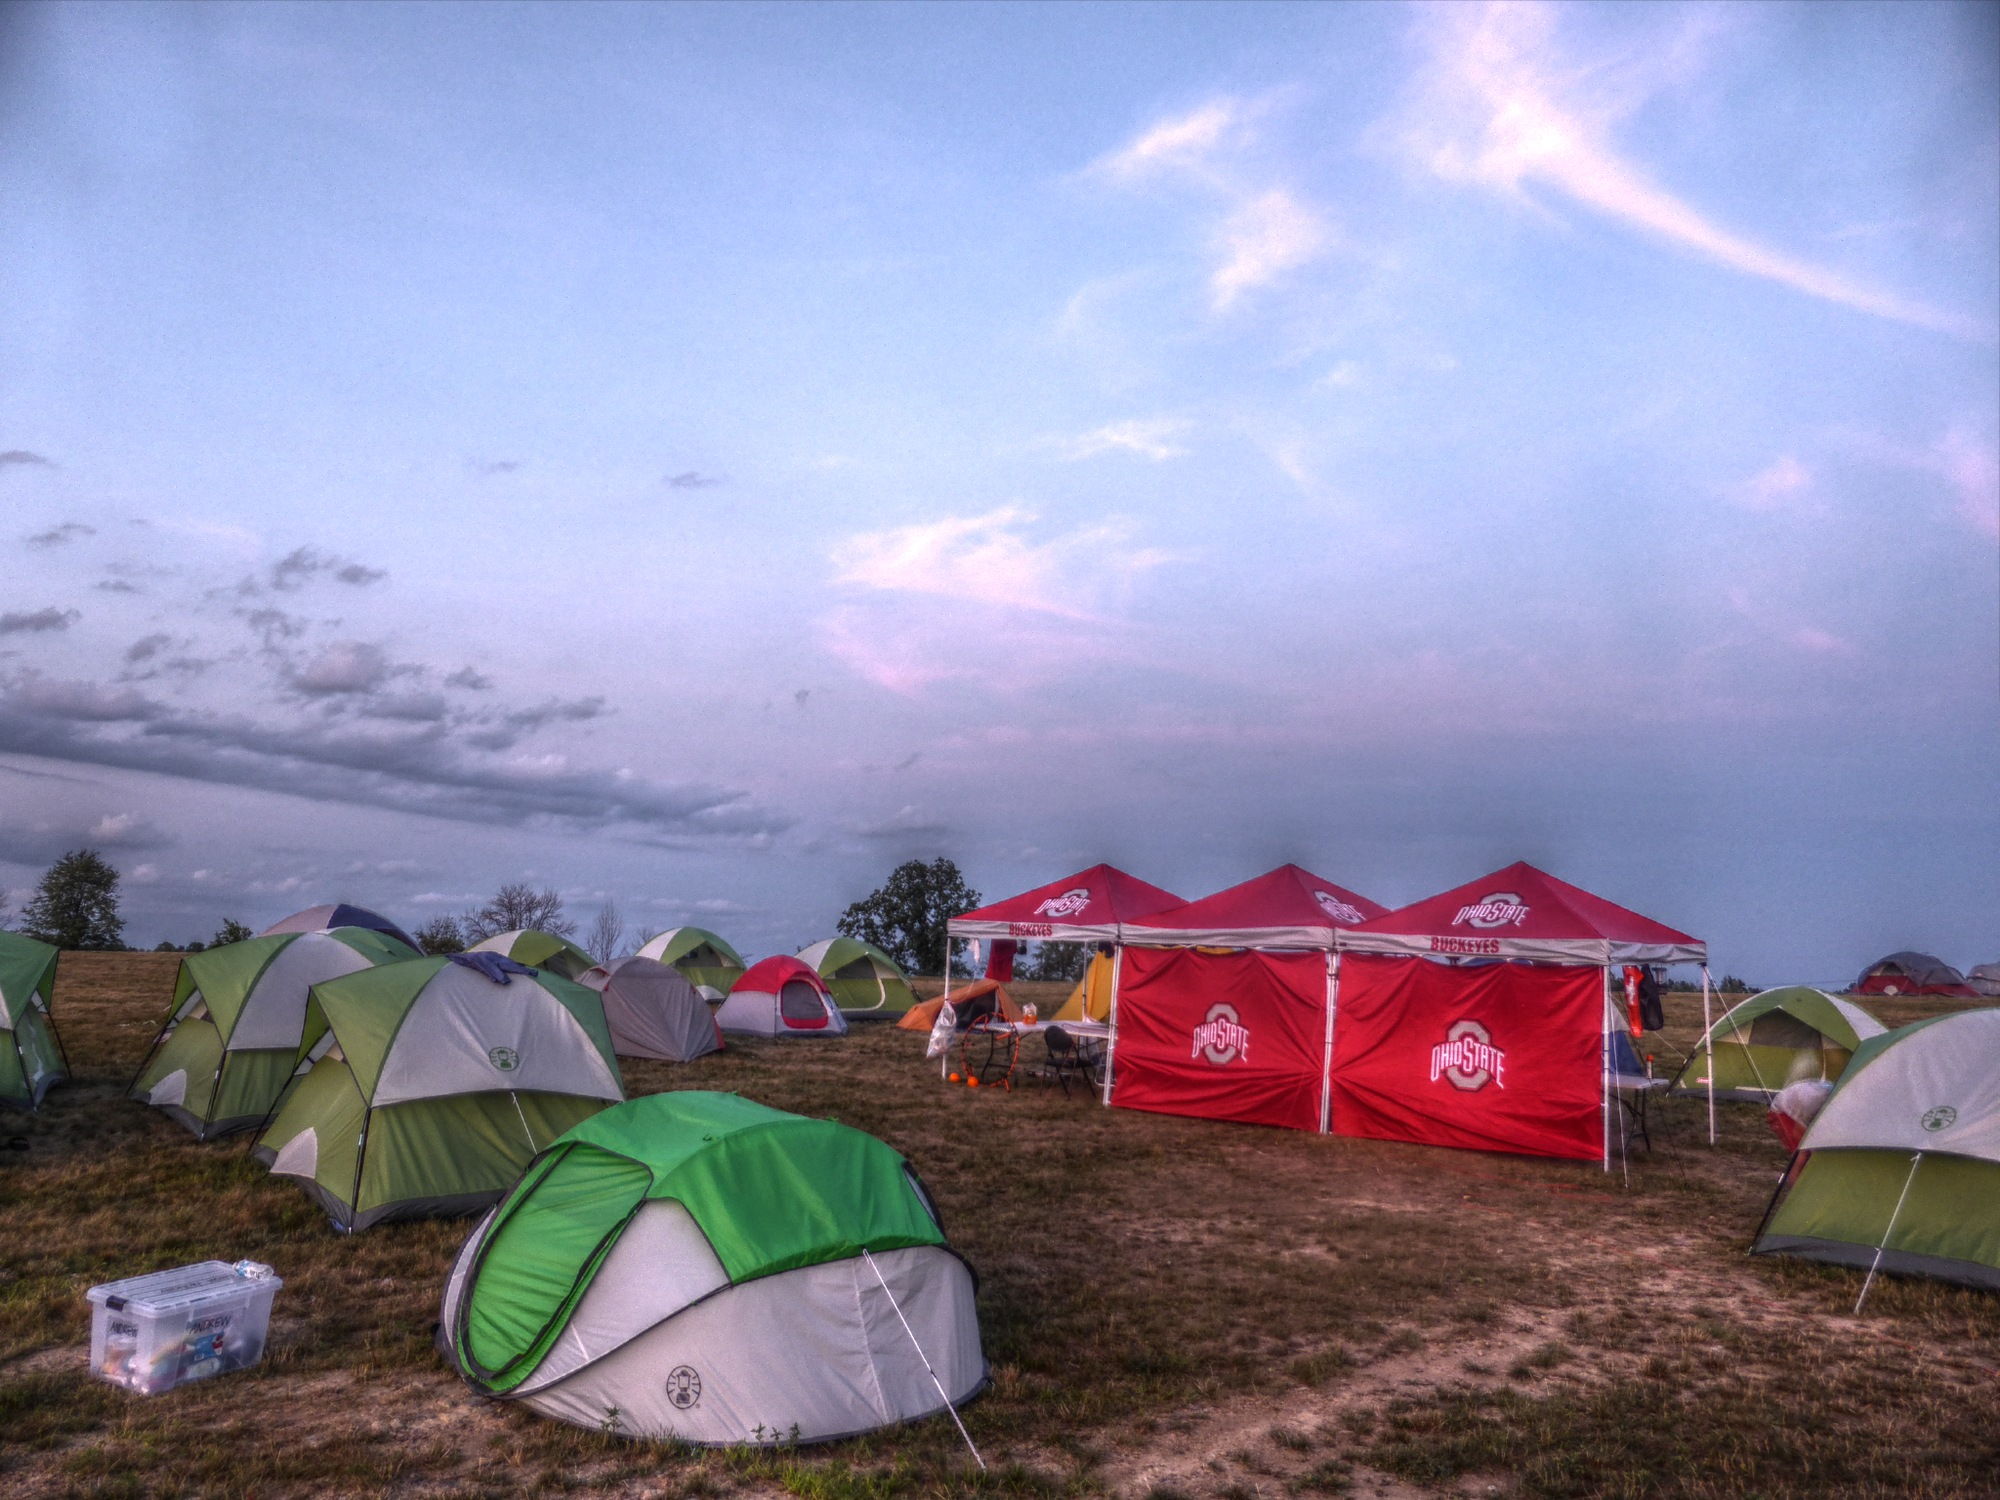 Das Zeltlager bei Sonnenuntergang.